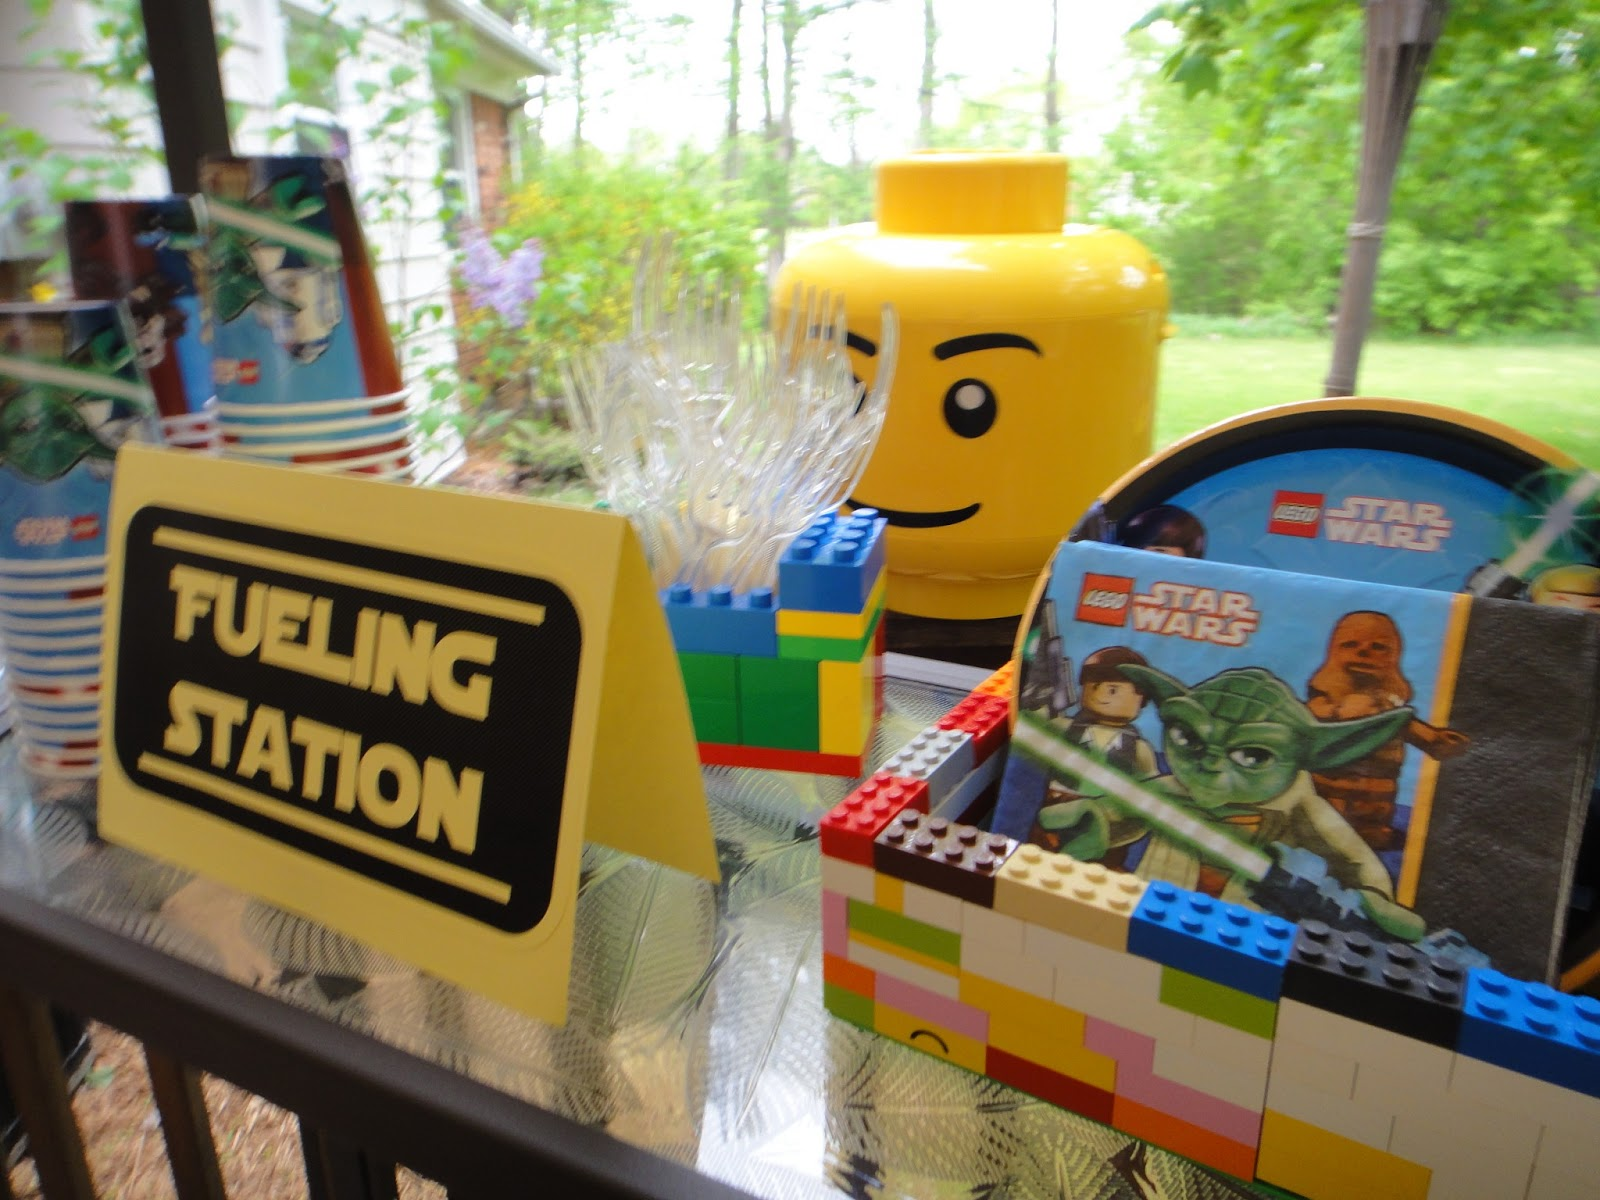 Lego Star Wars Party Free Printables Games Menu Ideas